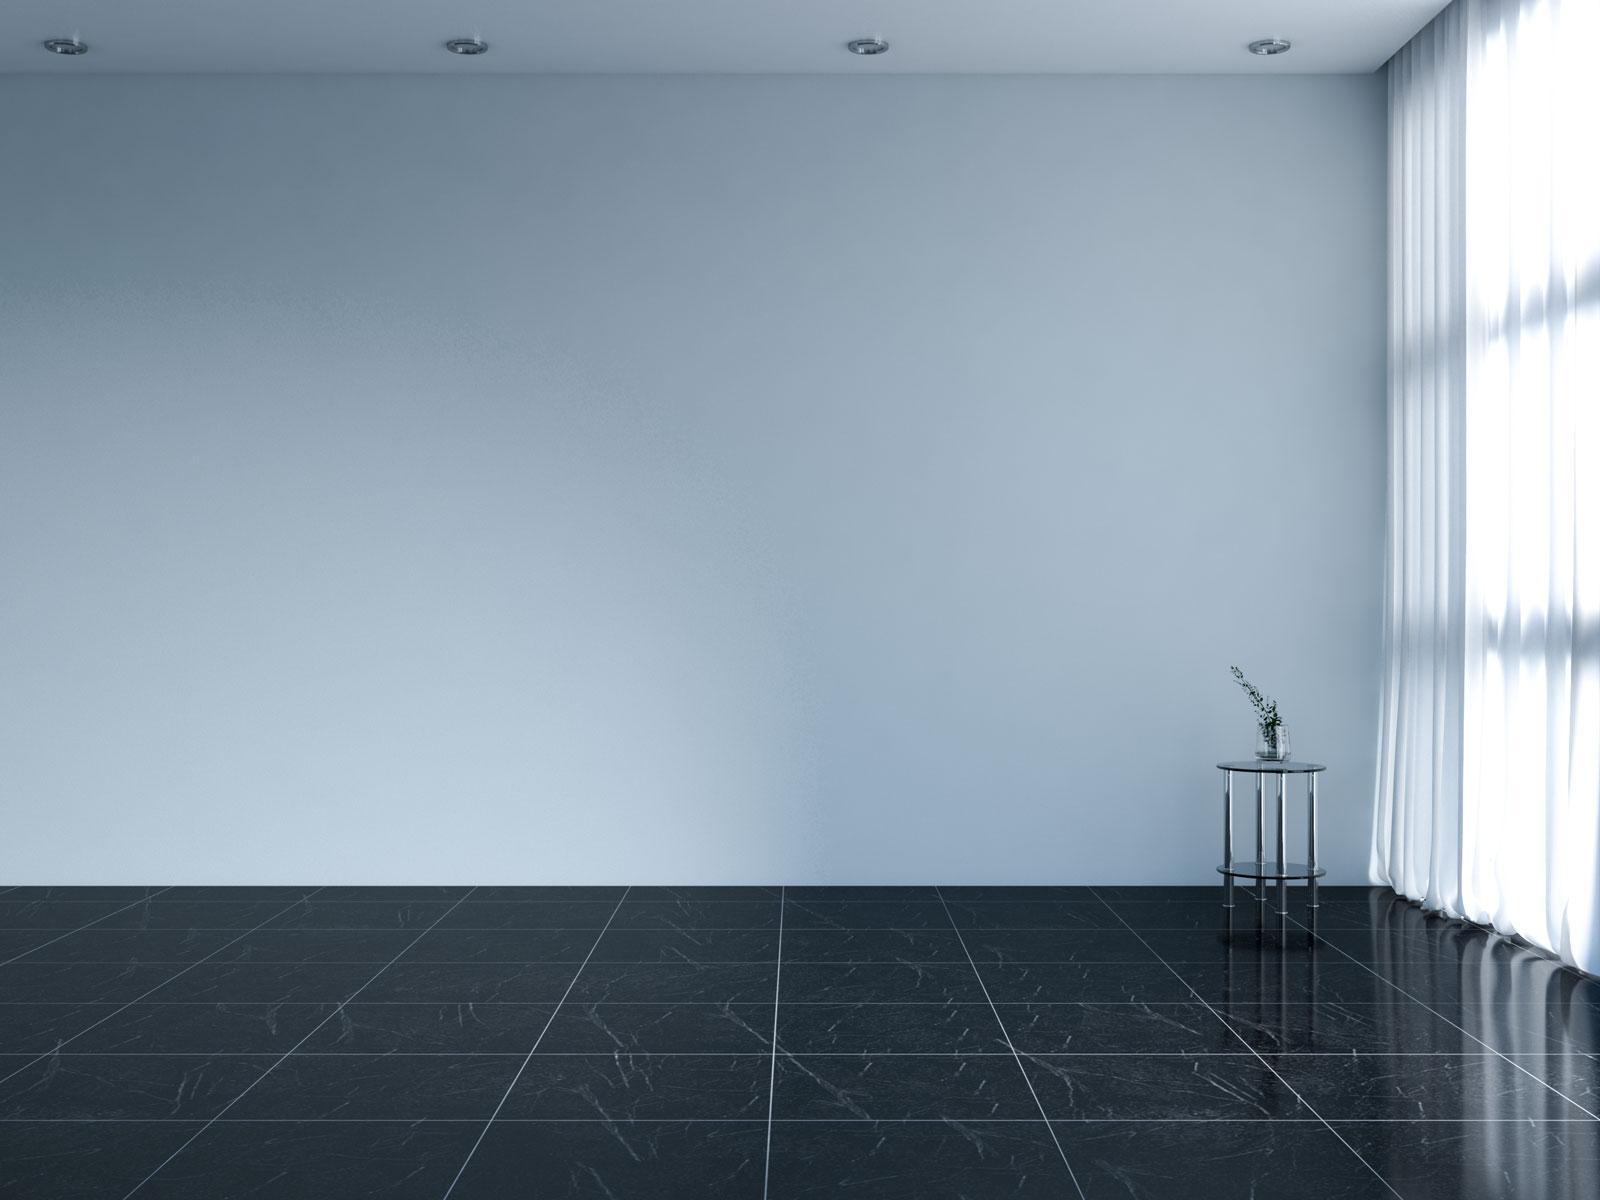 Misty blue wall with black floors